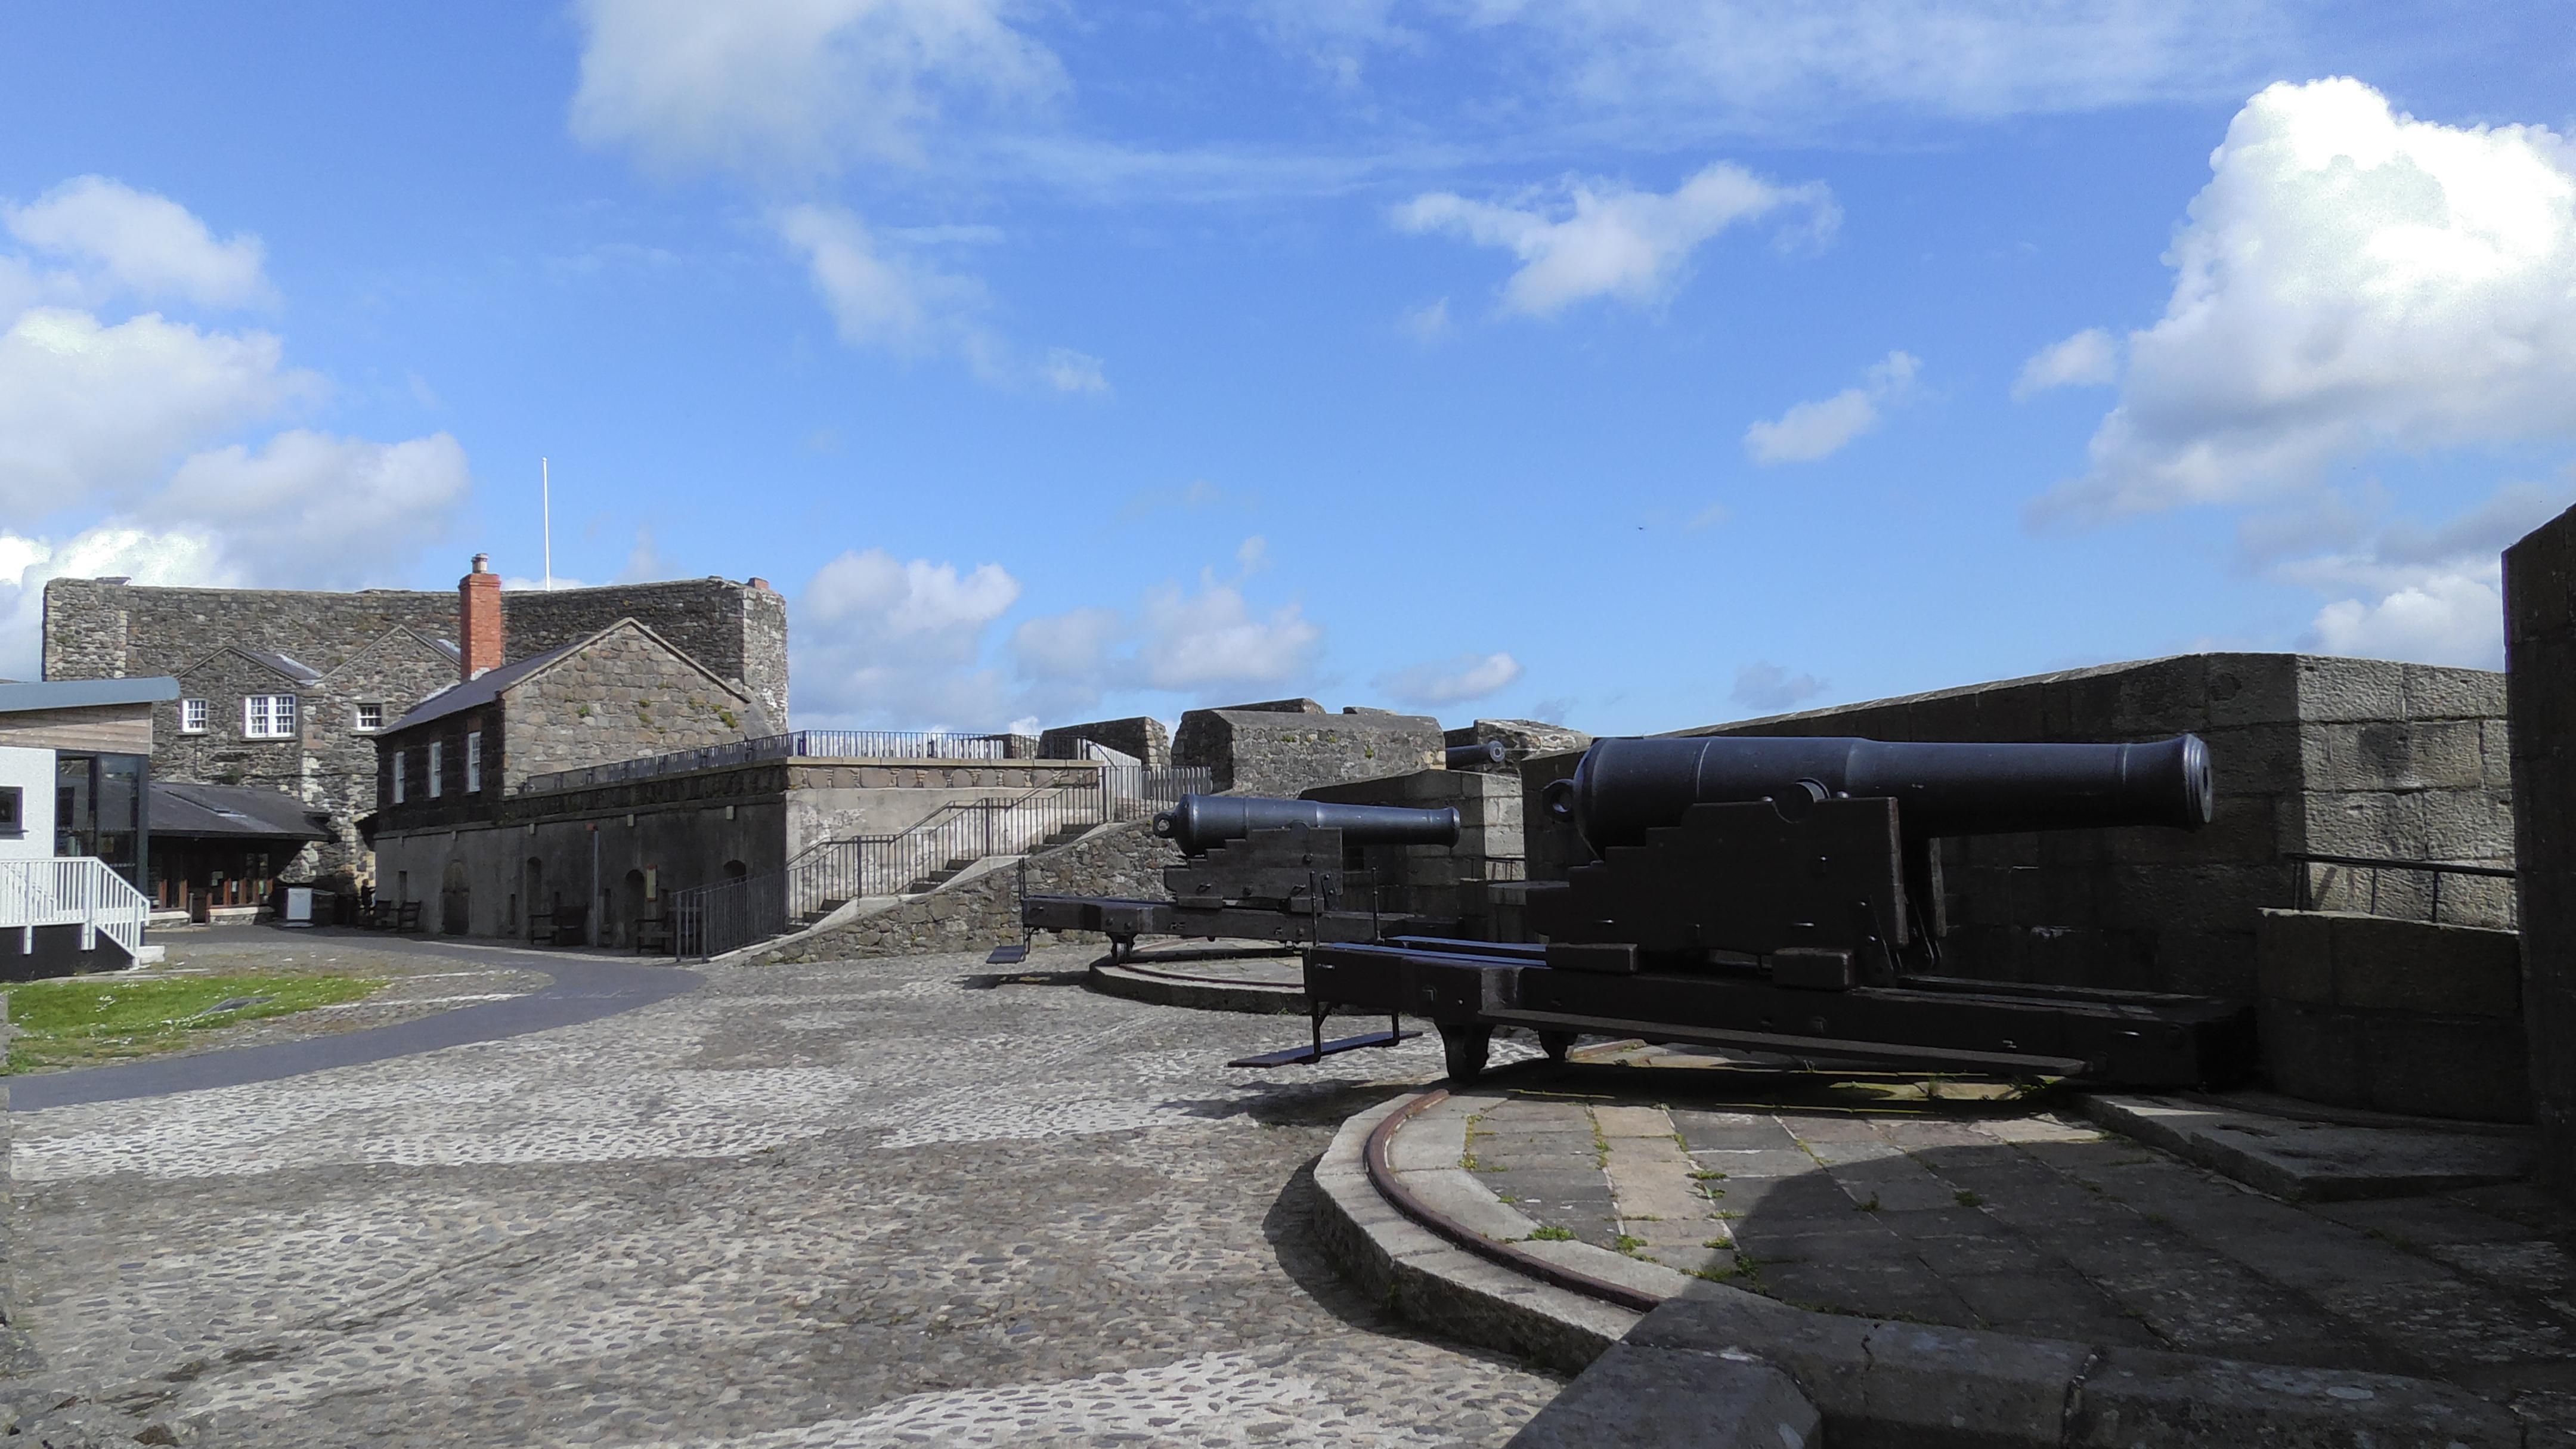 Kanonen Castle Carrickfergus